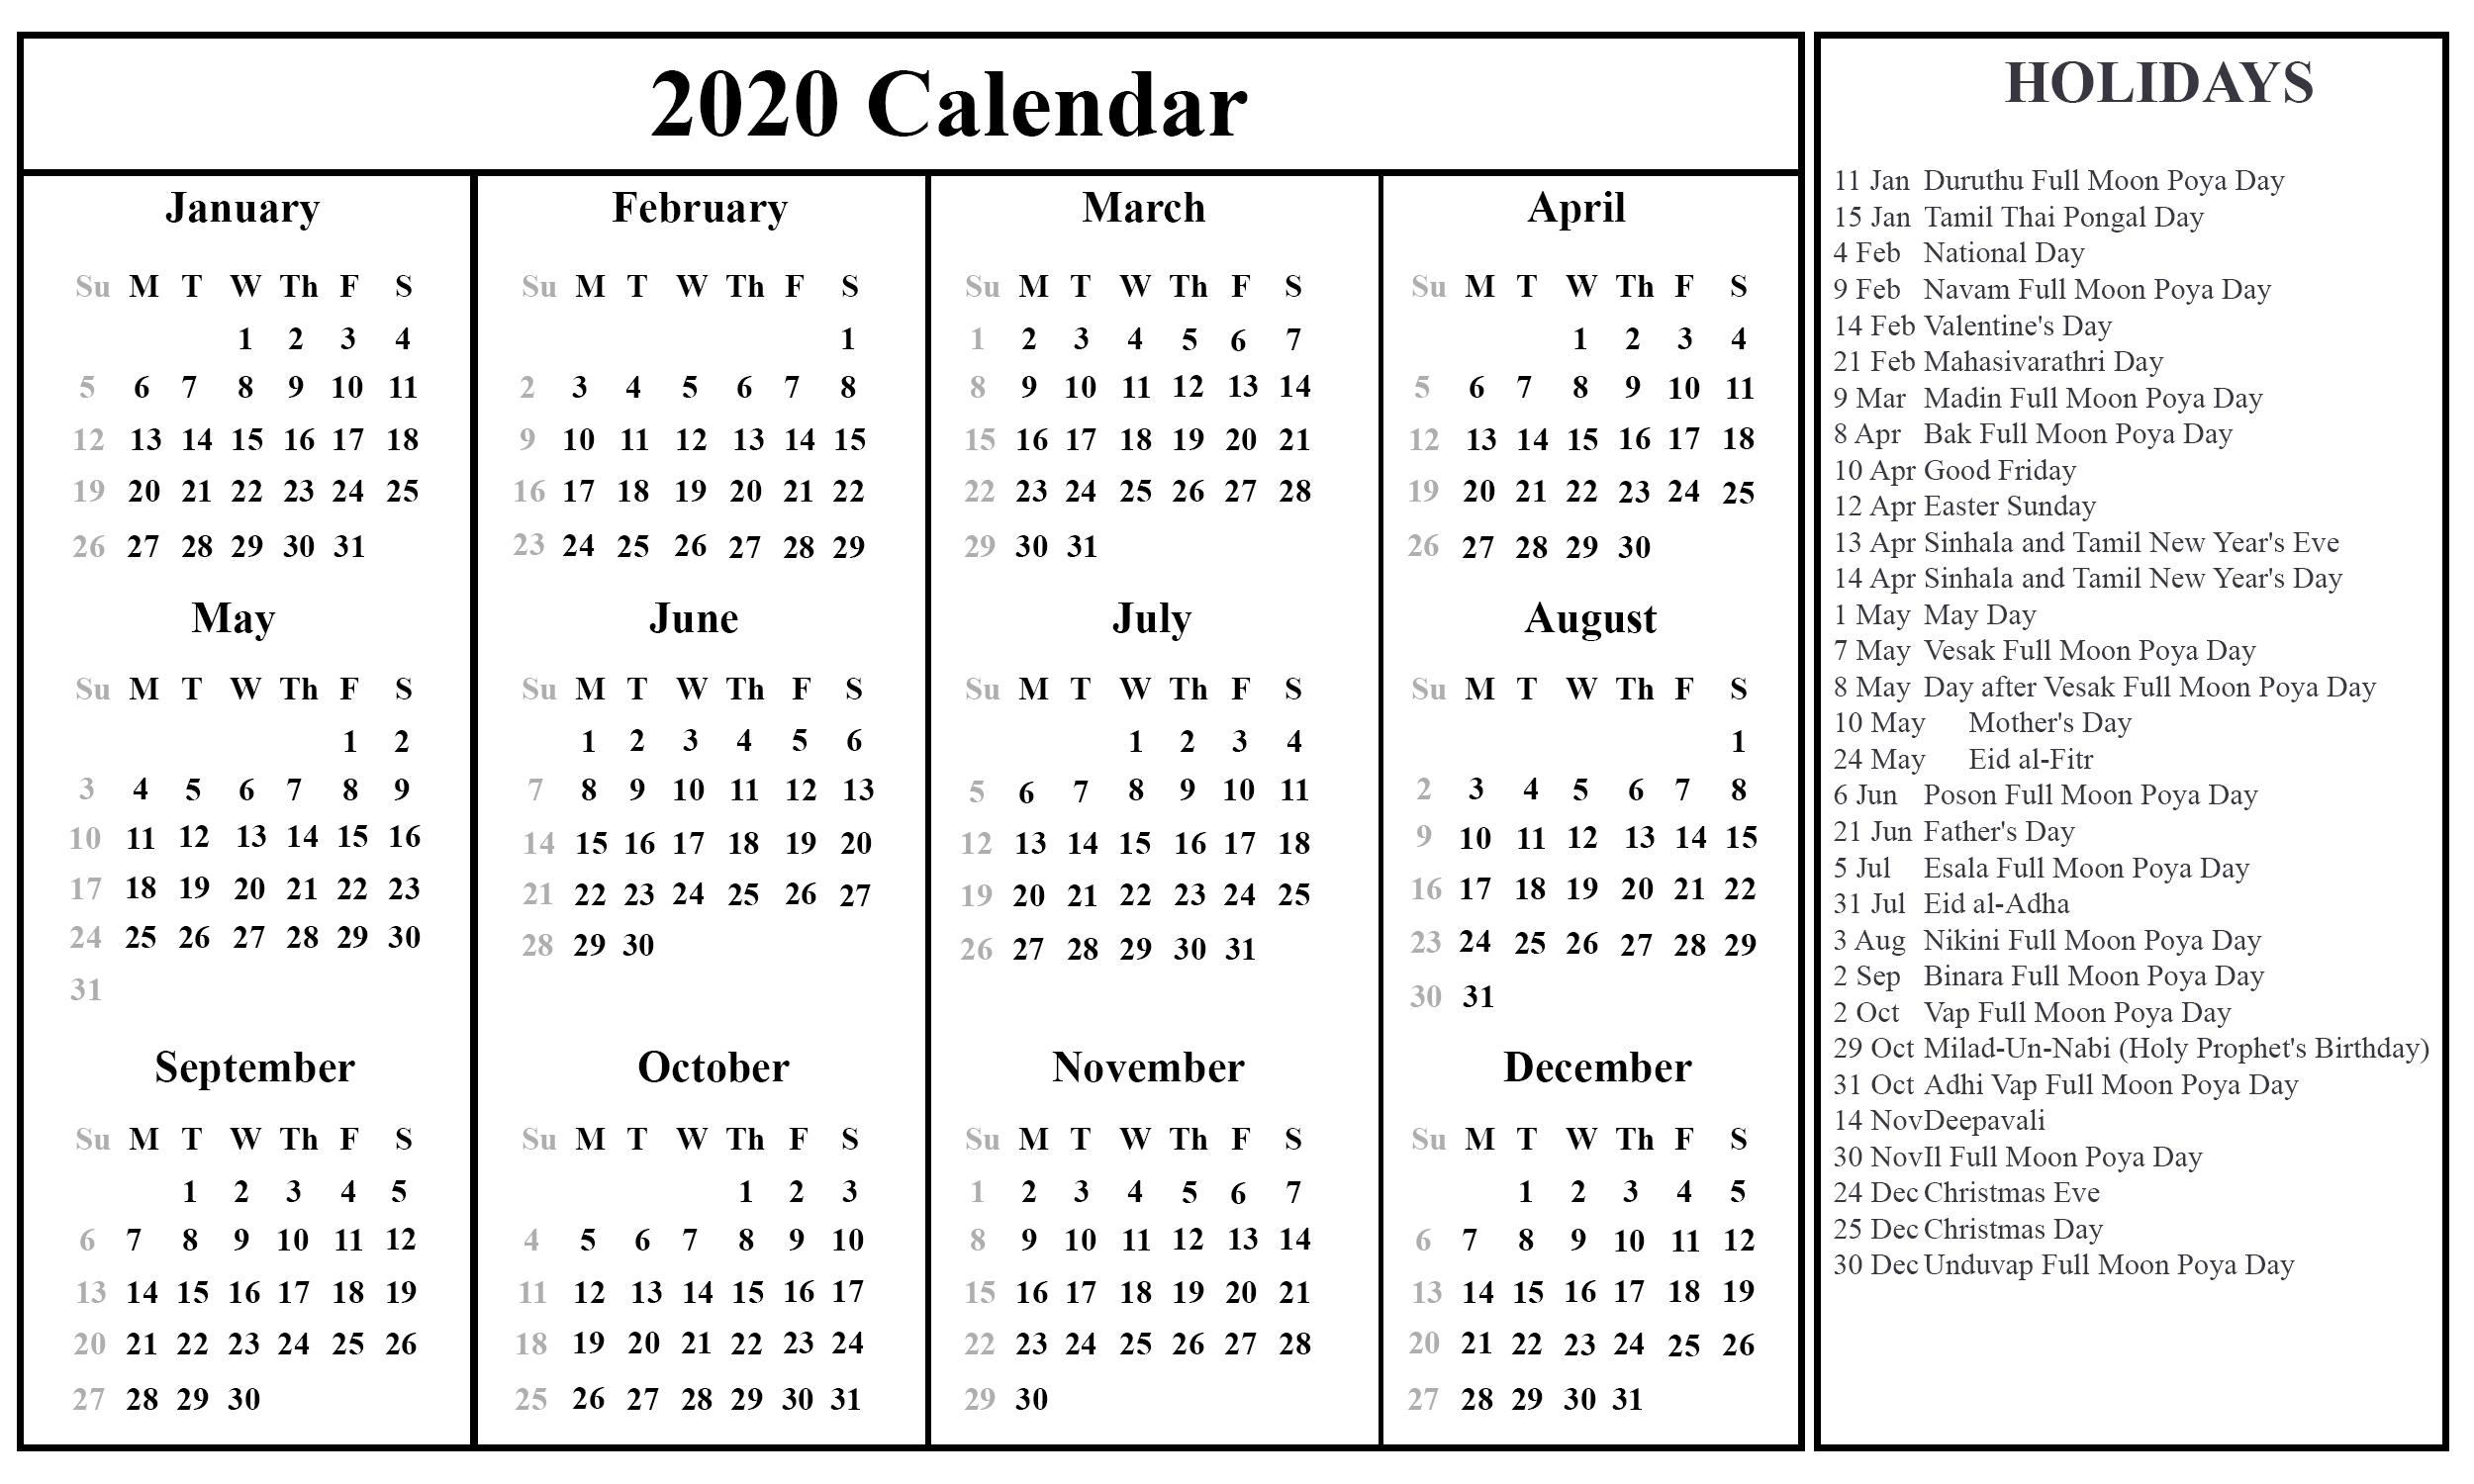 Printable August Calendar Template-Printable 2020 Calendar With Malaysian Holidays